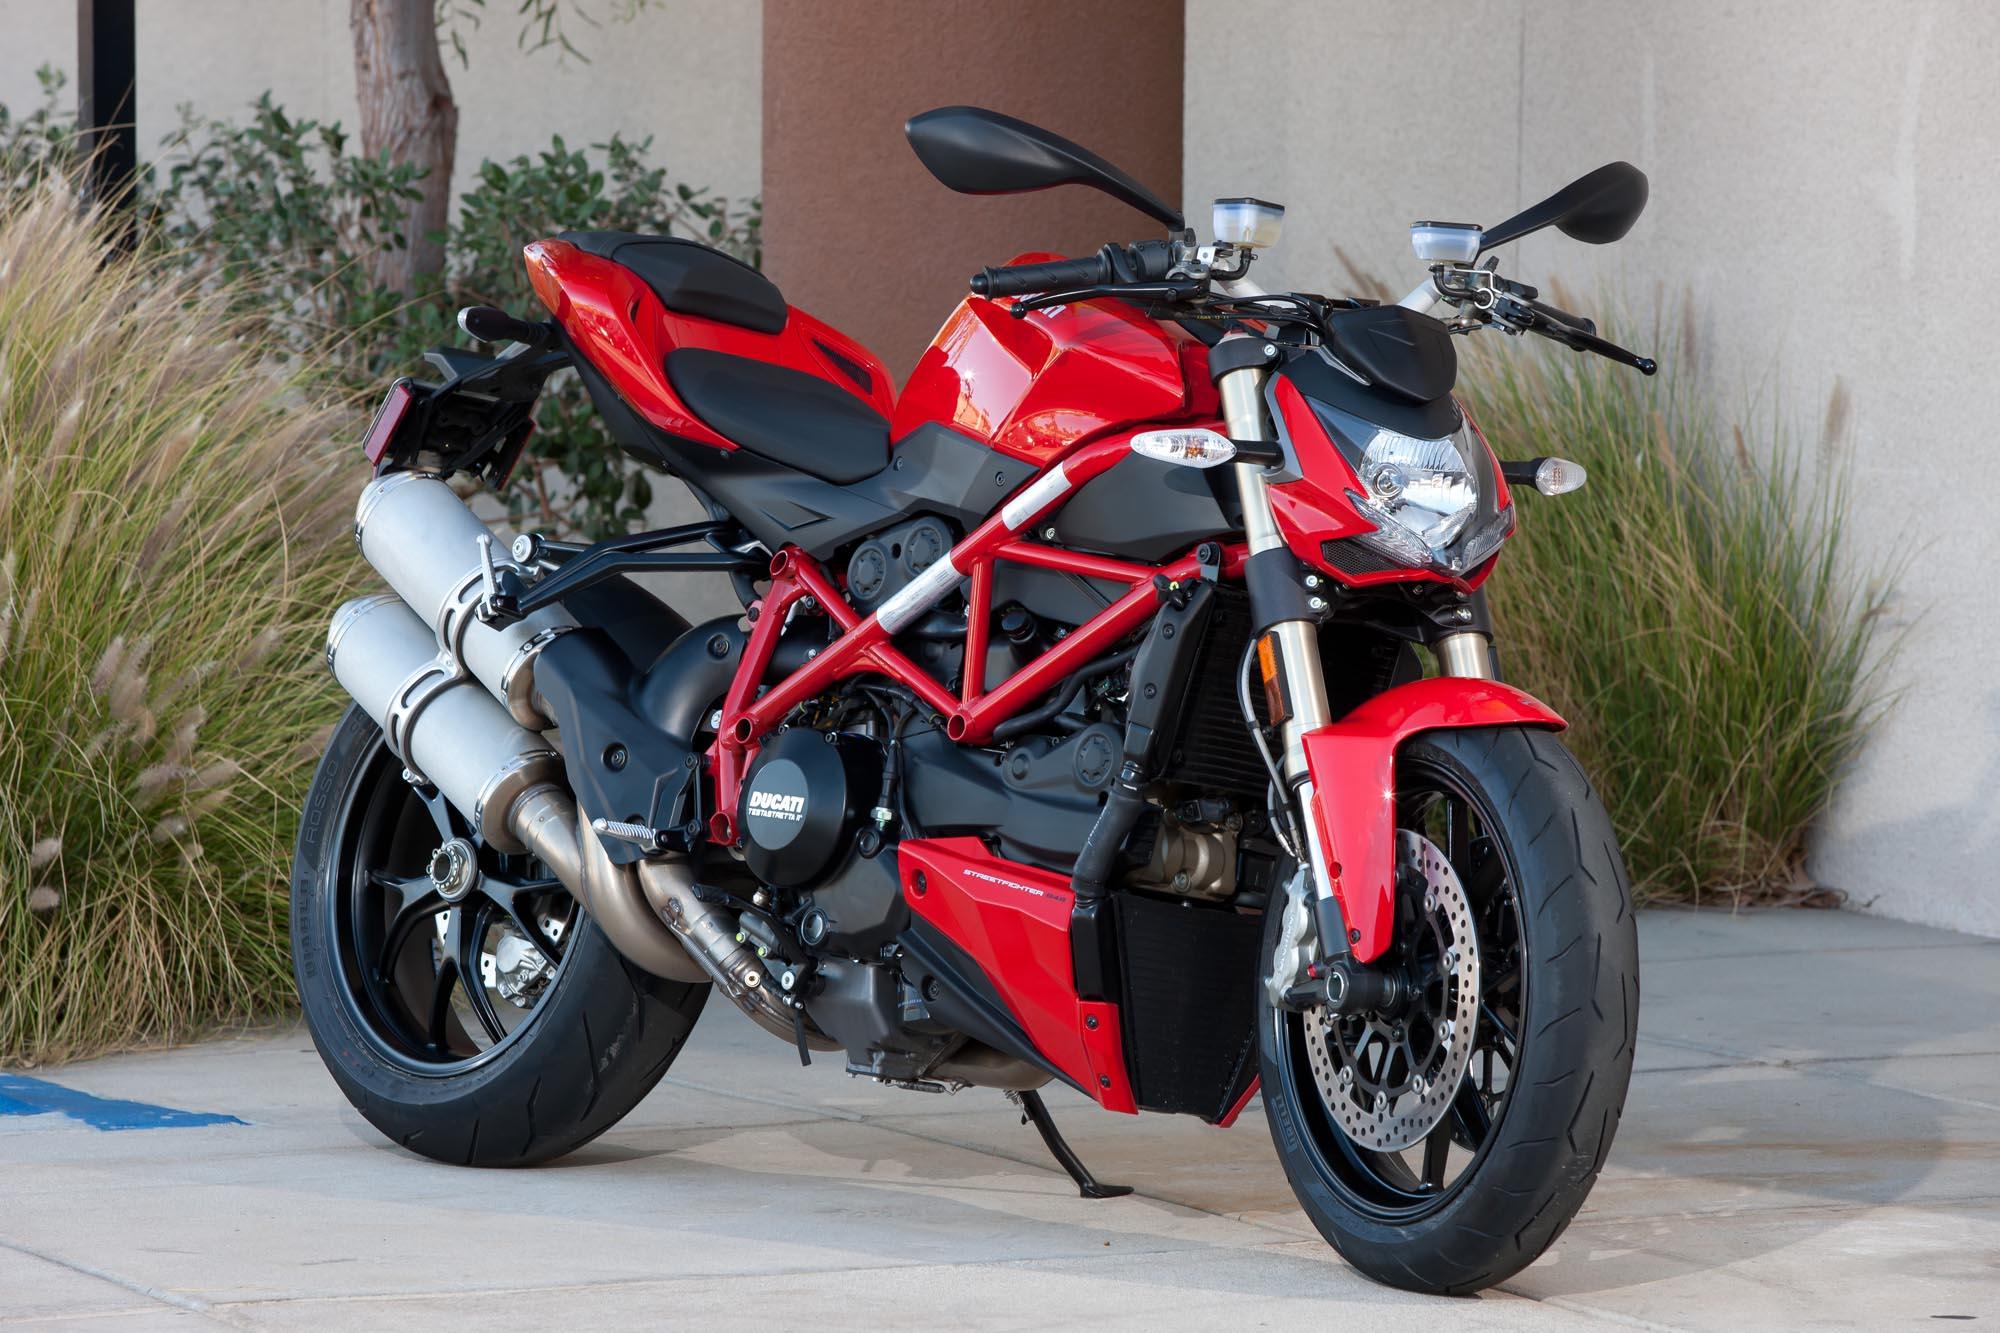 Ducati Streetfighter Philippines